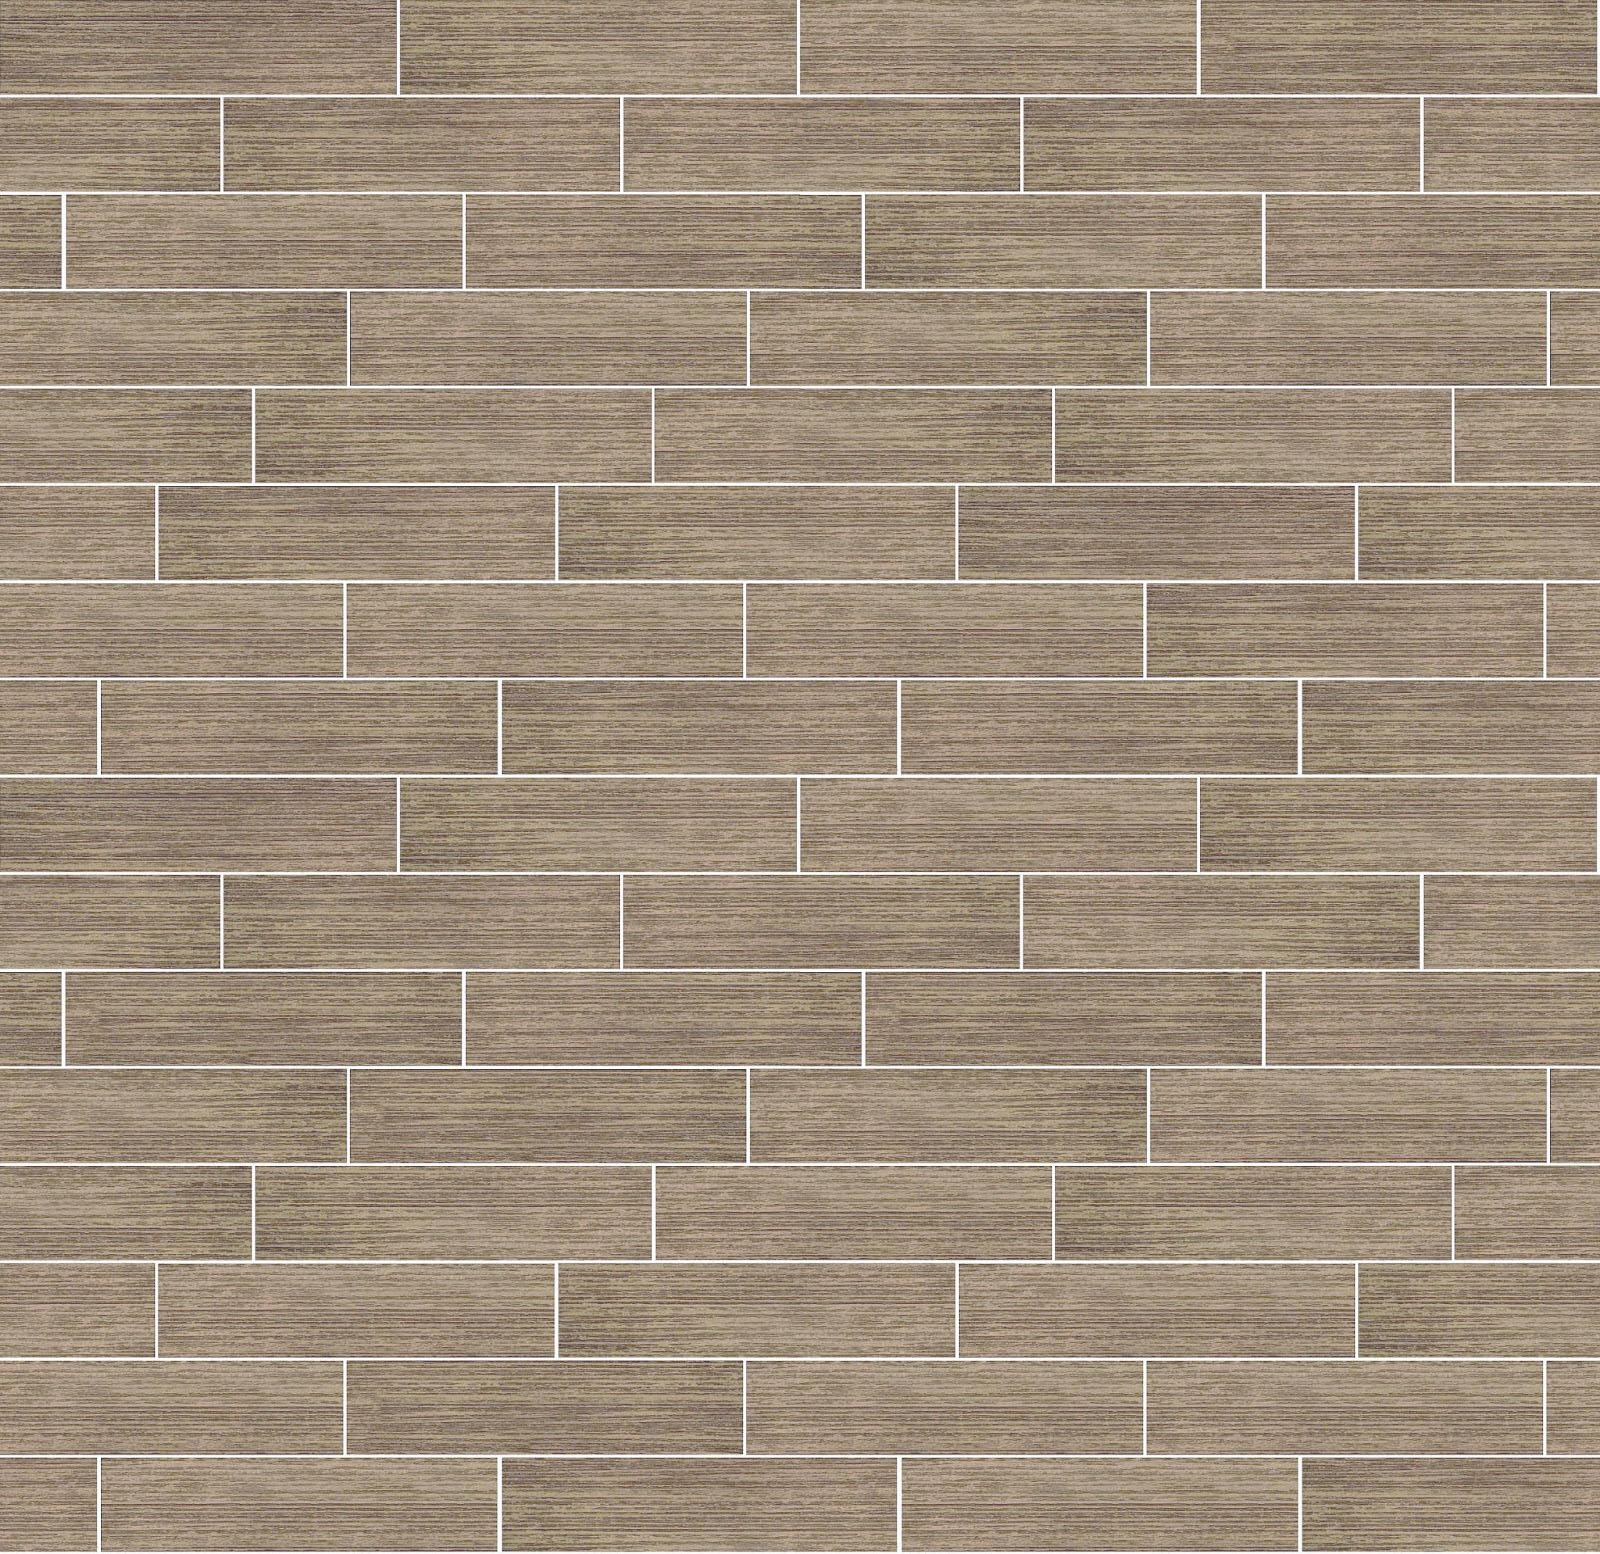 Simo 3d Blogspot Com Texture Seamless Pavimento Listoni